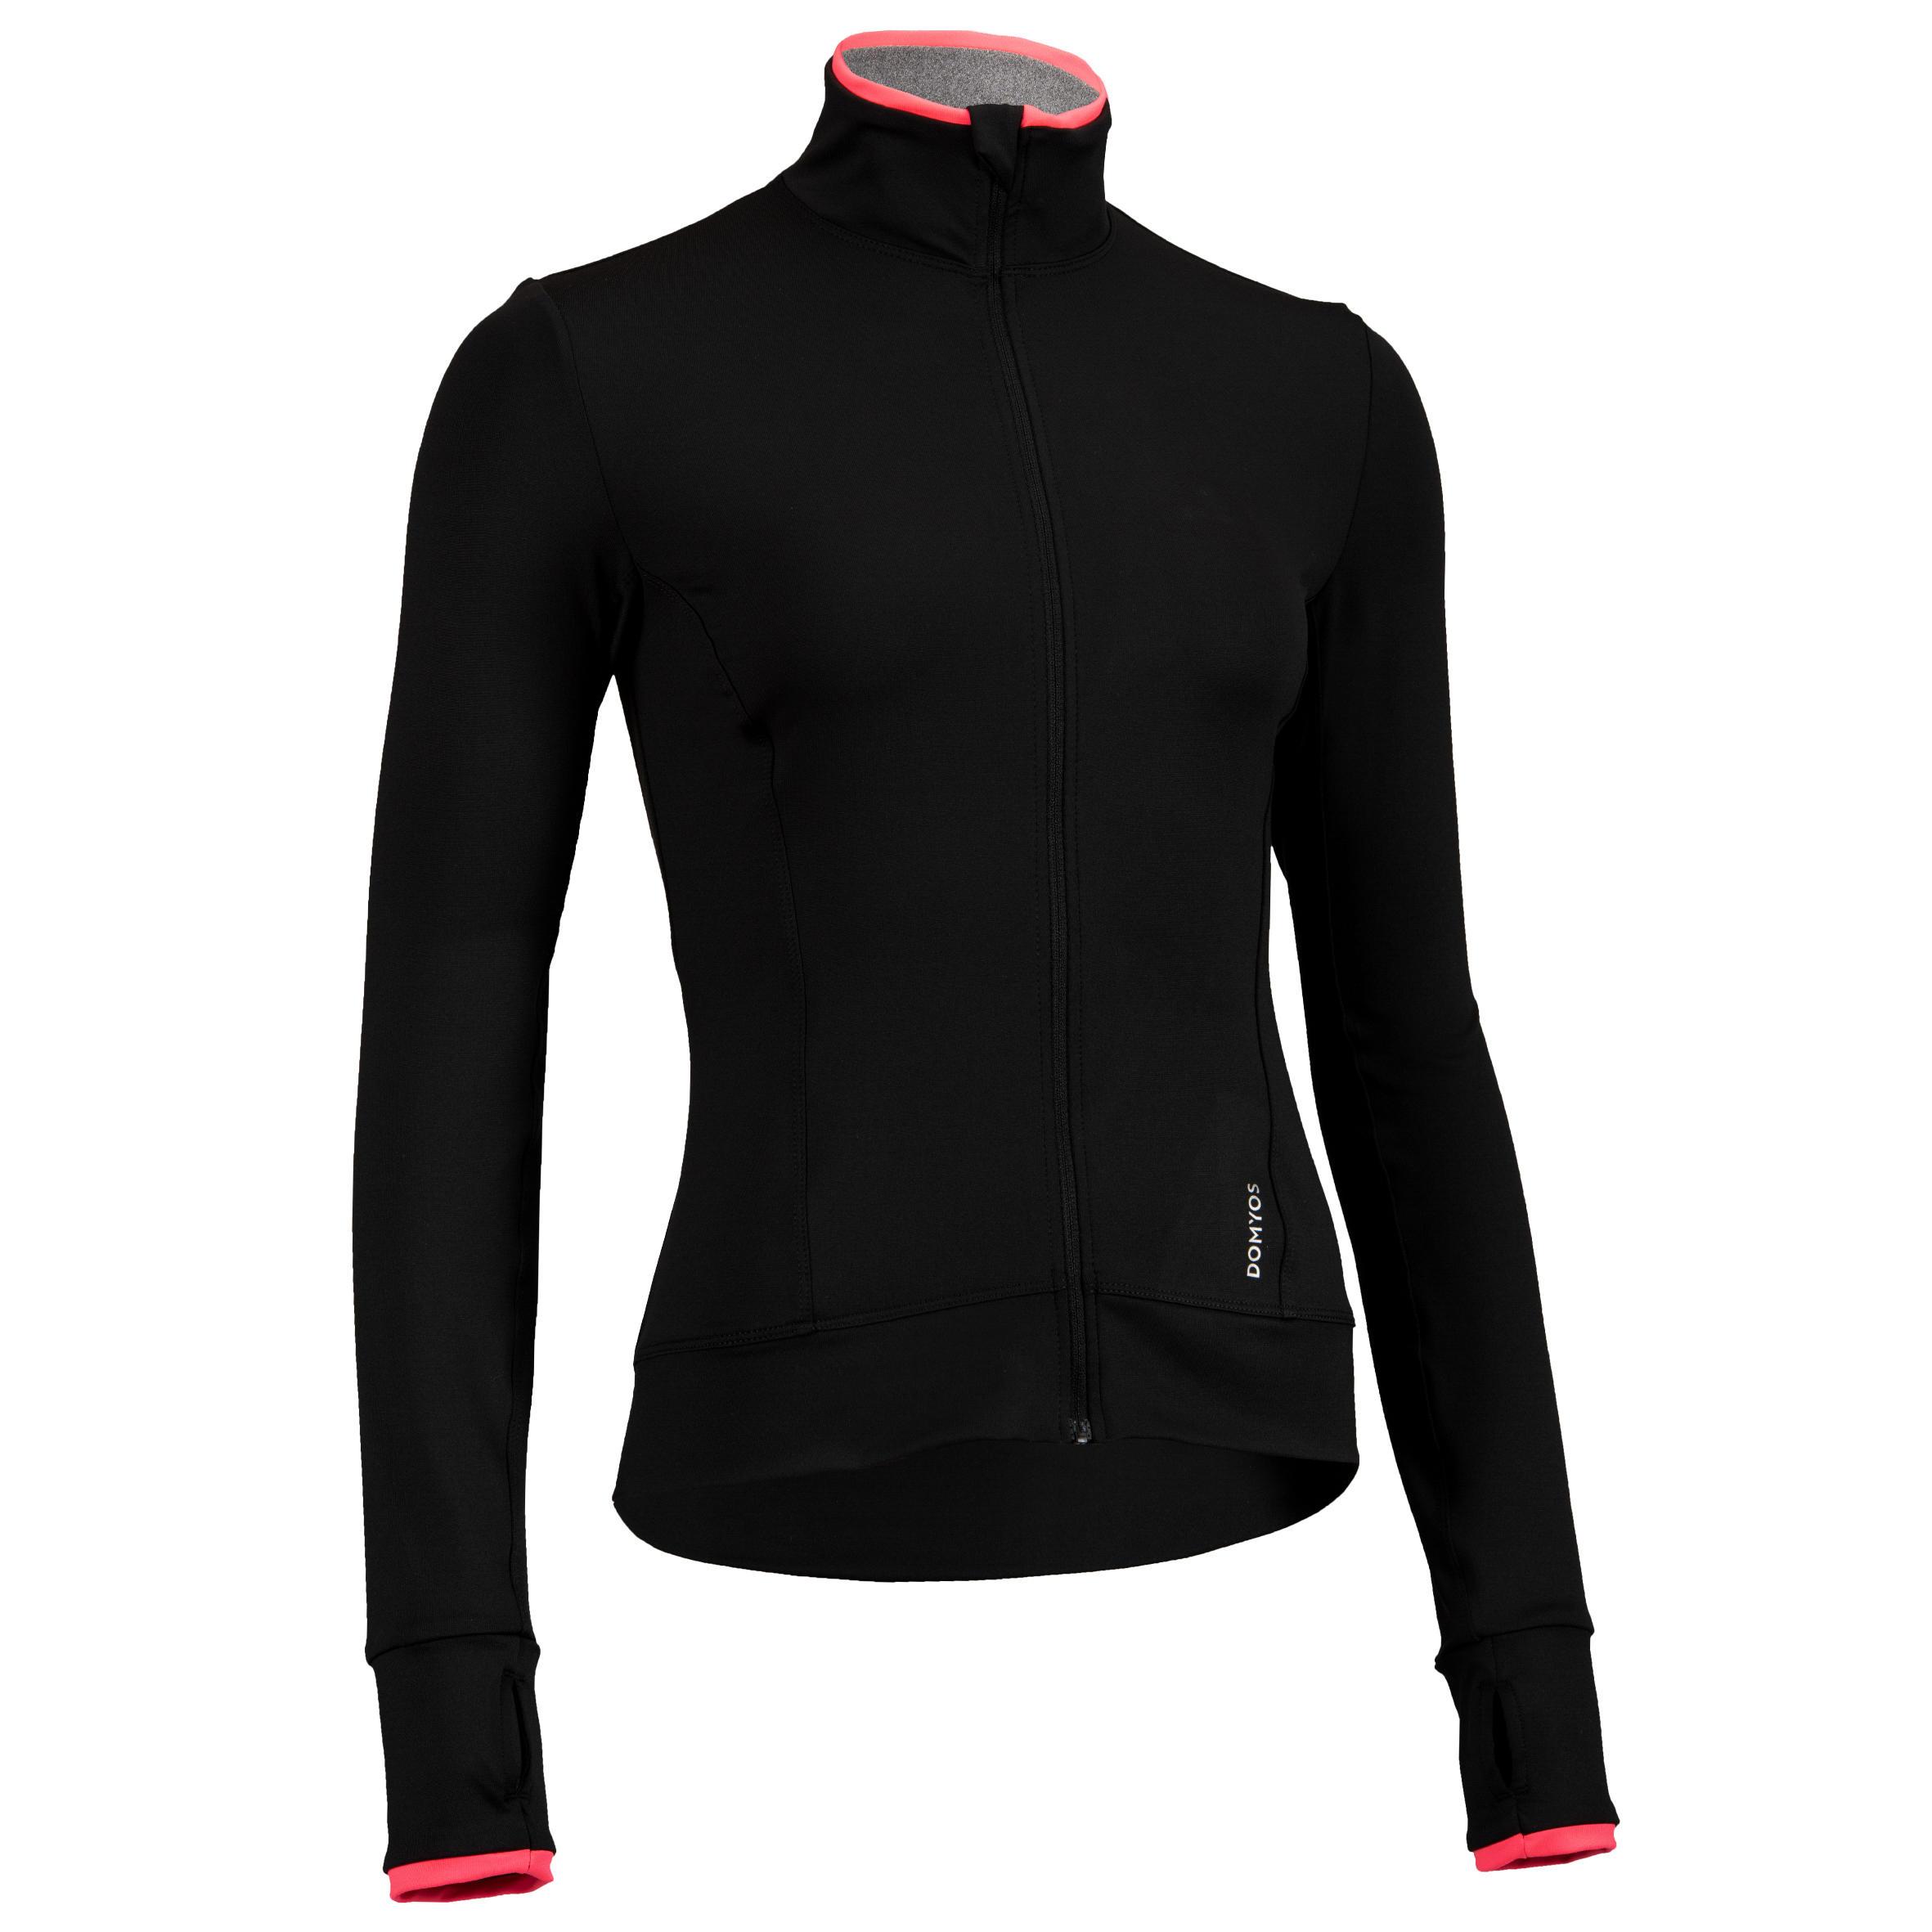 100 Women's Fitness Cardio Training Jacket - Black